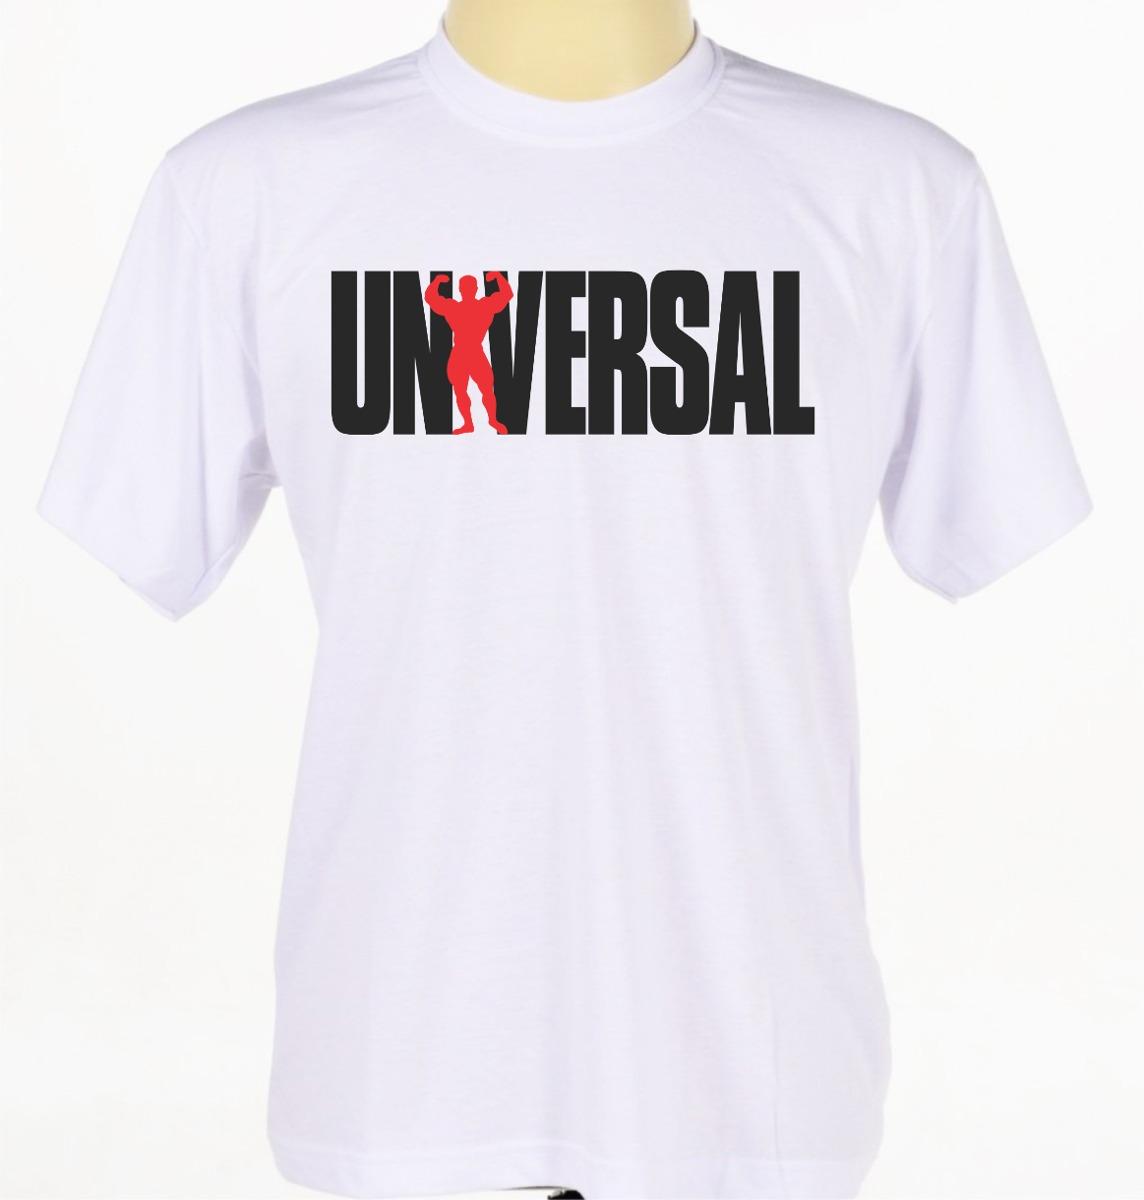 f3a33f849 camiseta estampada personalizada academia universal camisa. Carregando zoom.